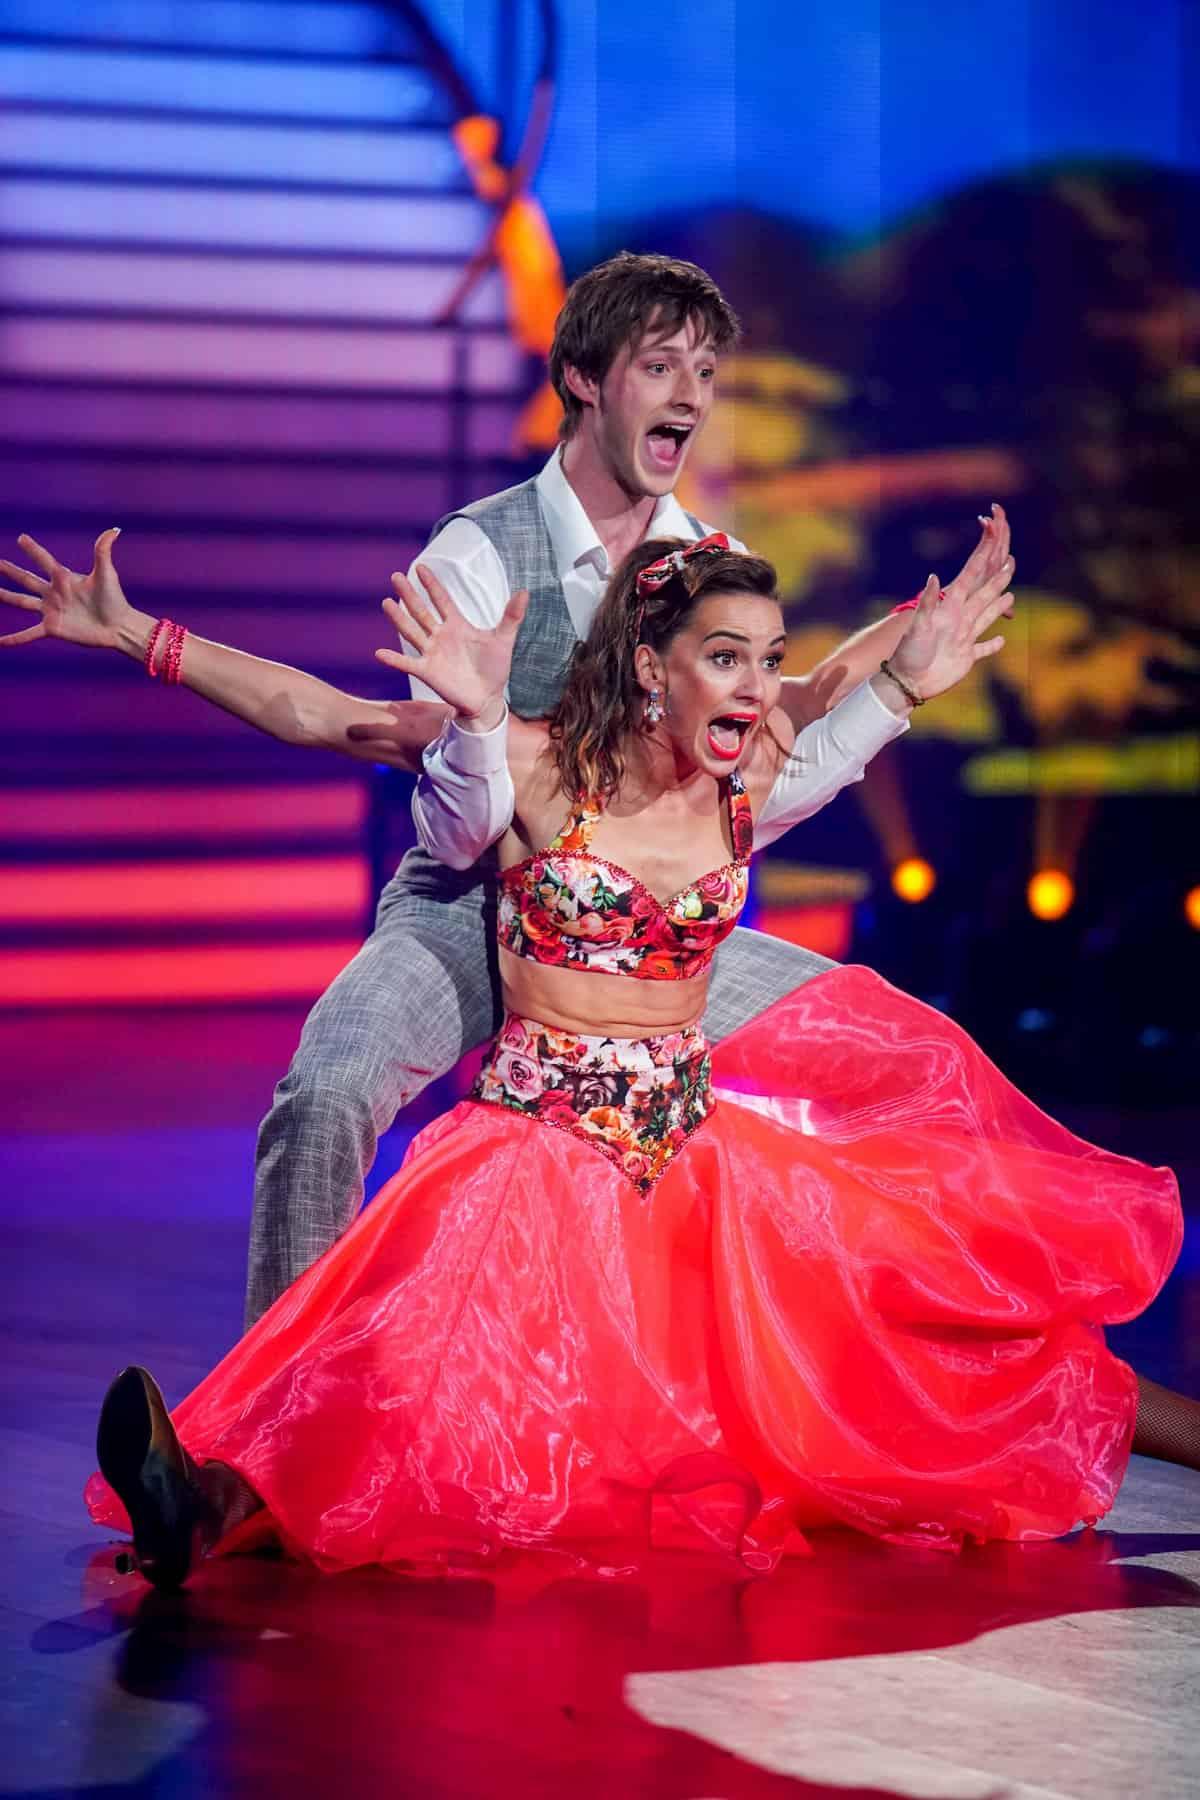 Moritz Hans - Renata Lusin bei Let's dance am 27.3.2020